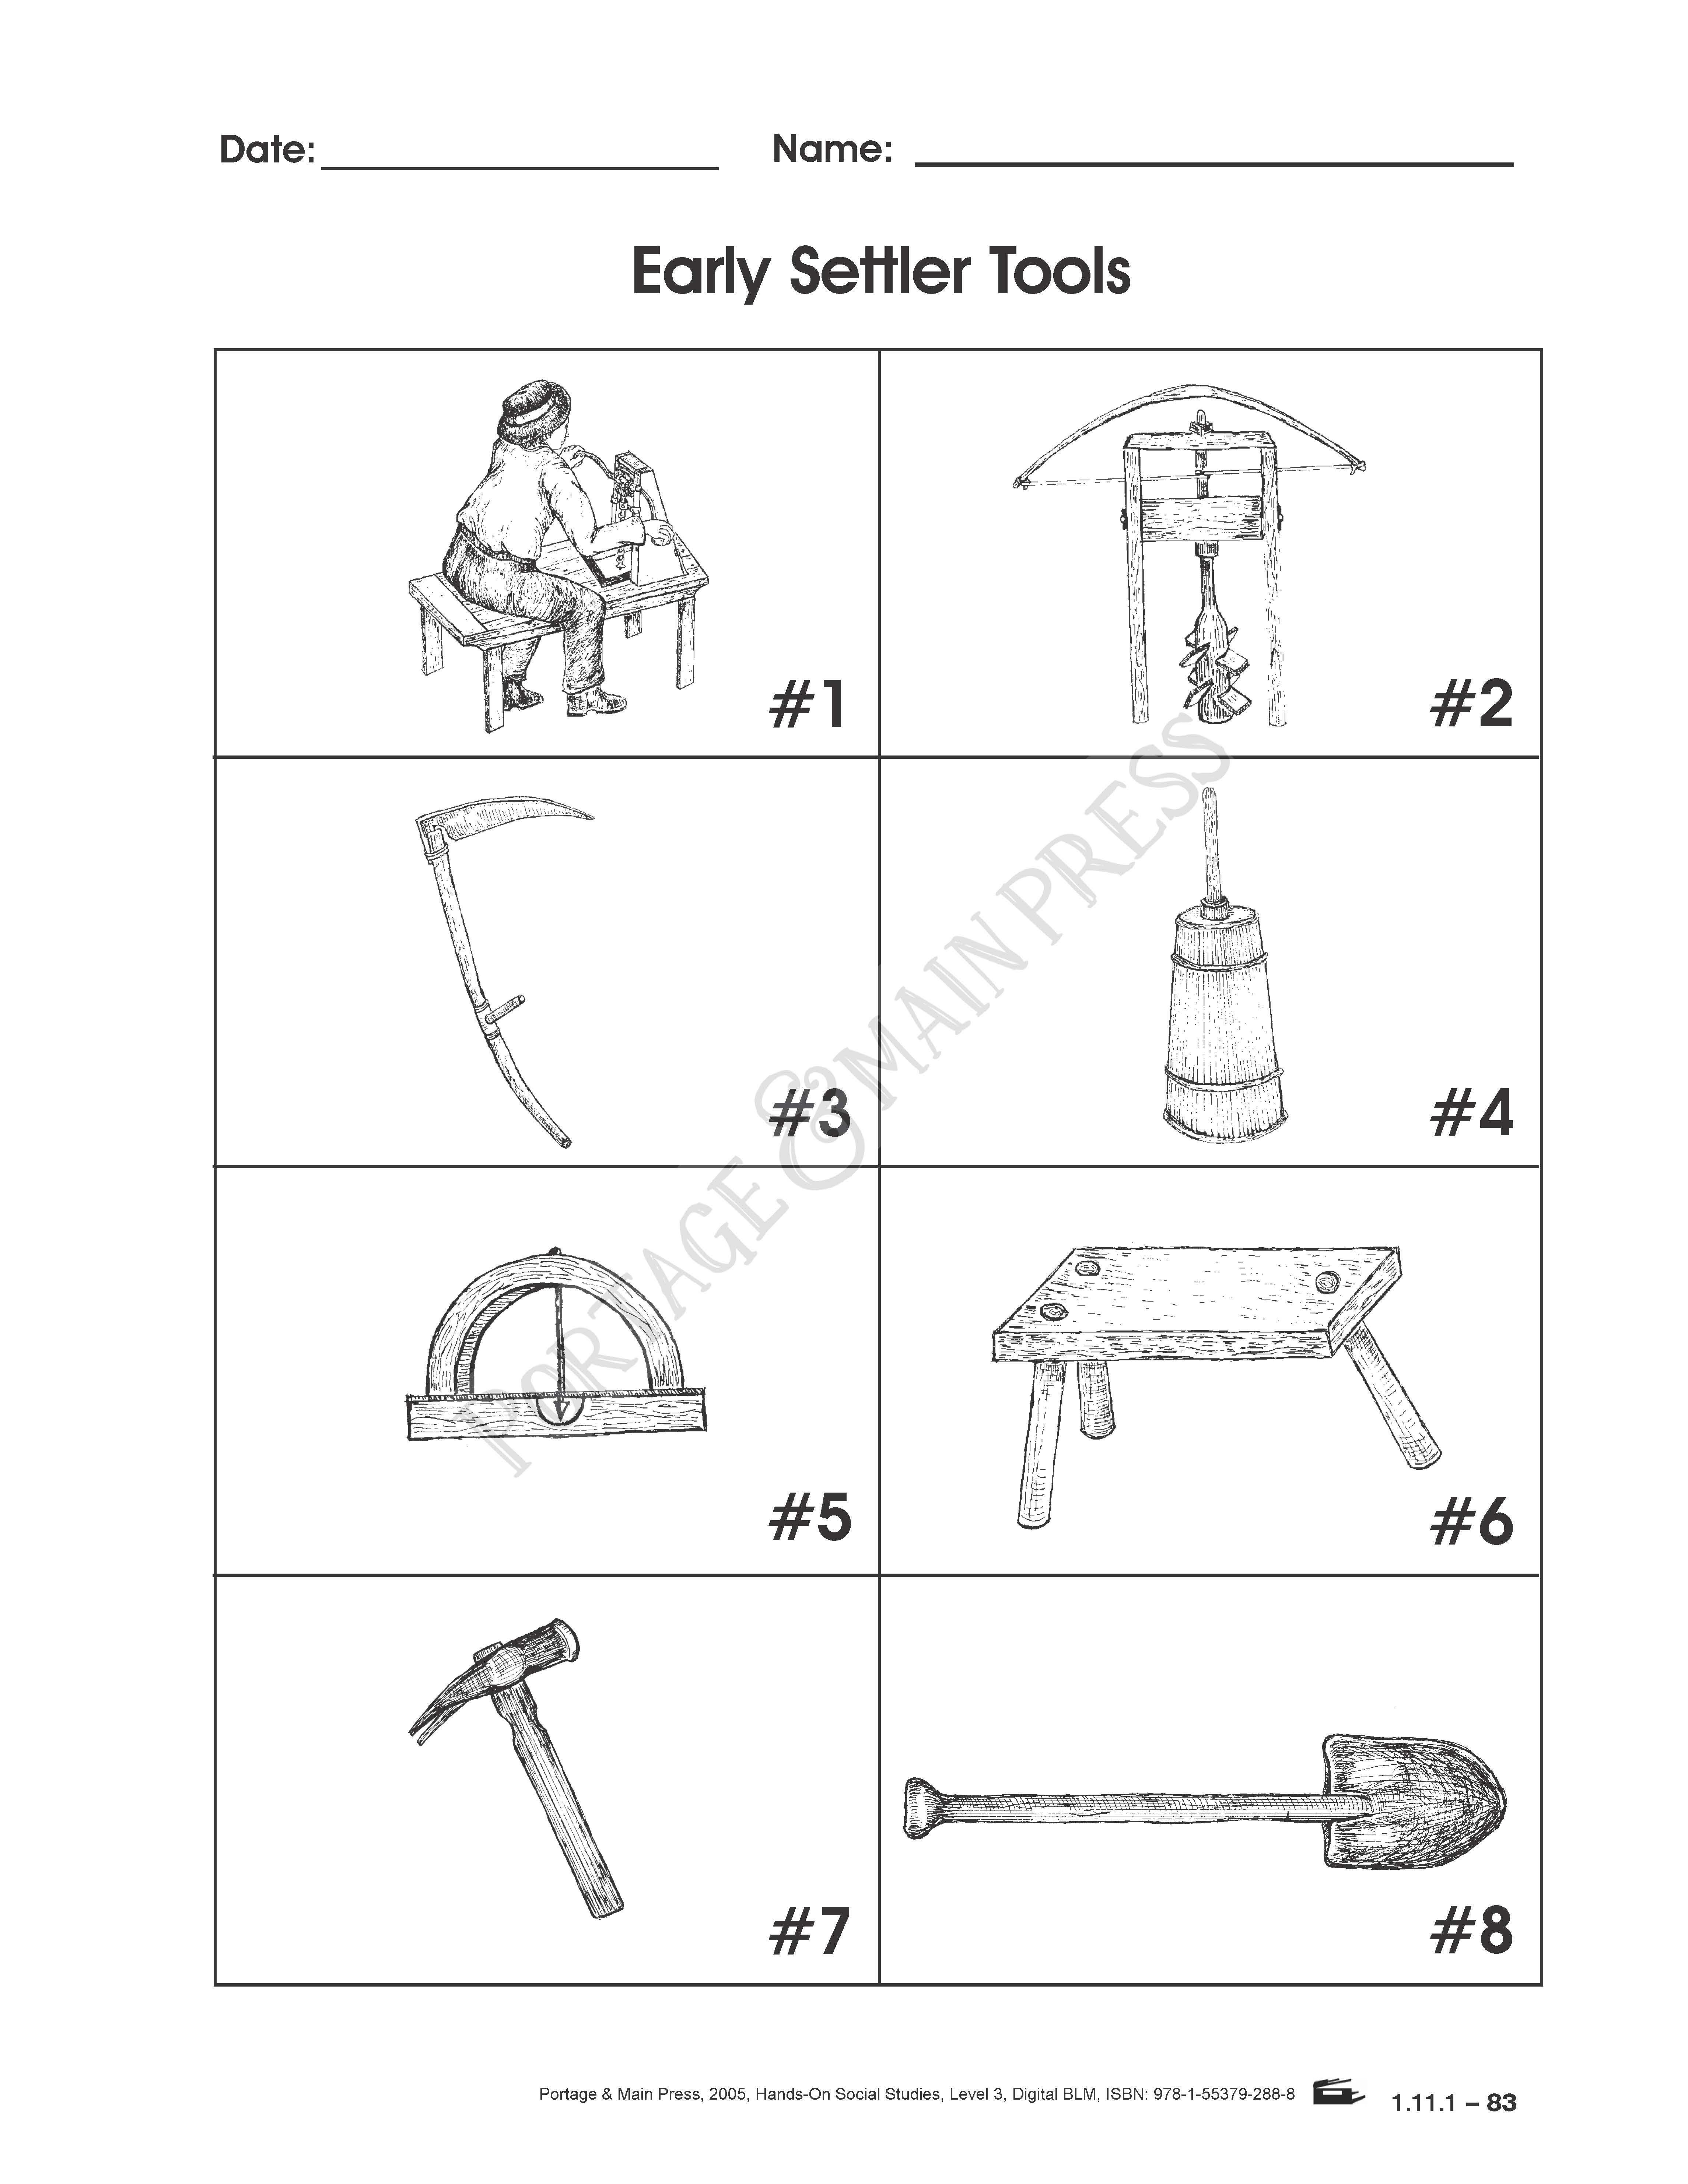 Grade 3 Social Stu s Early Settler Tools activity sheet